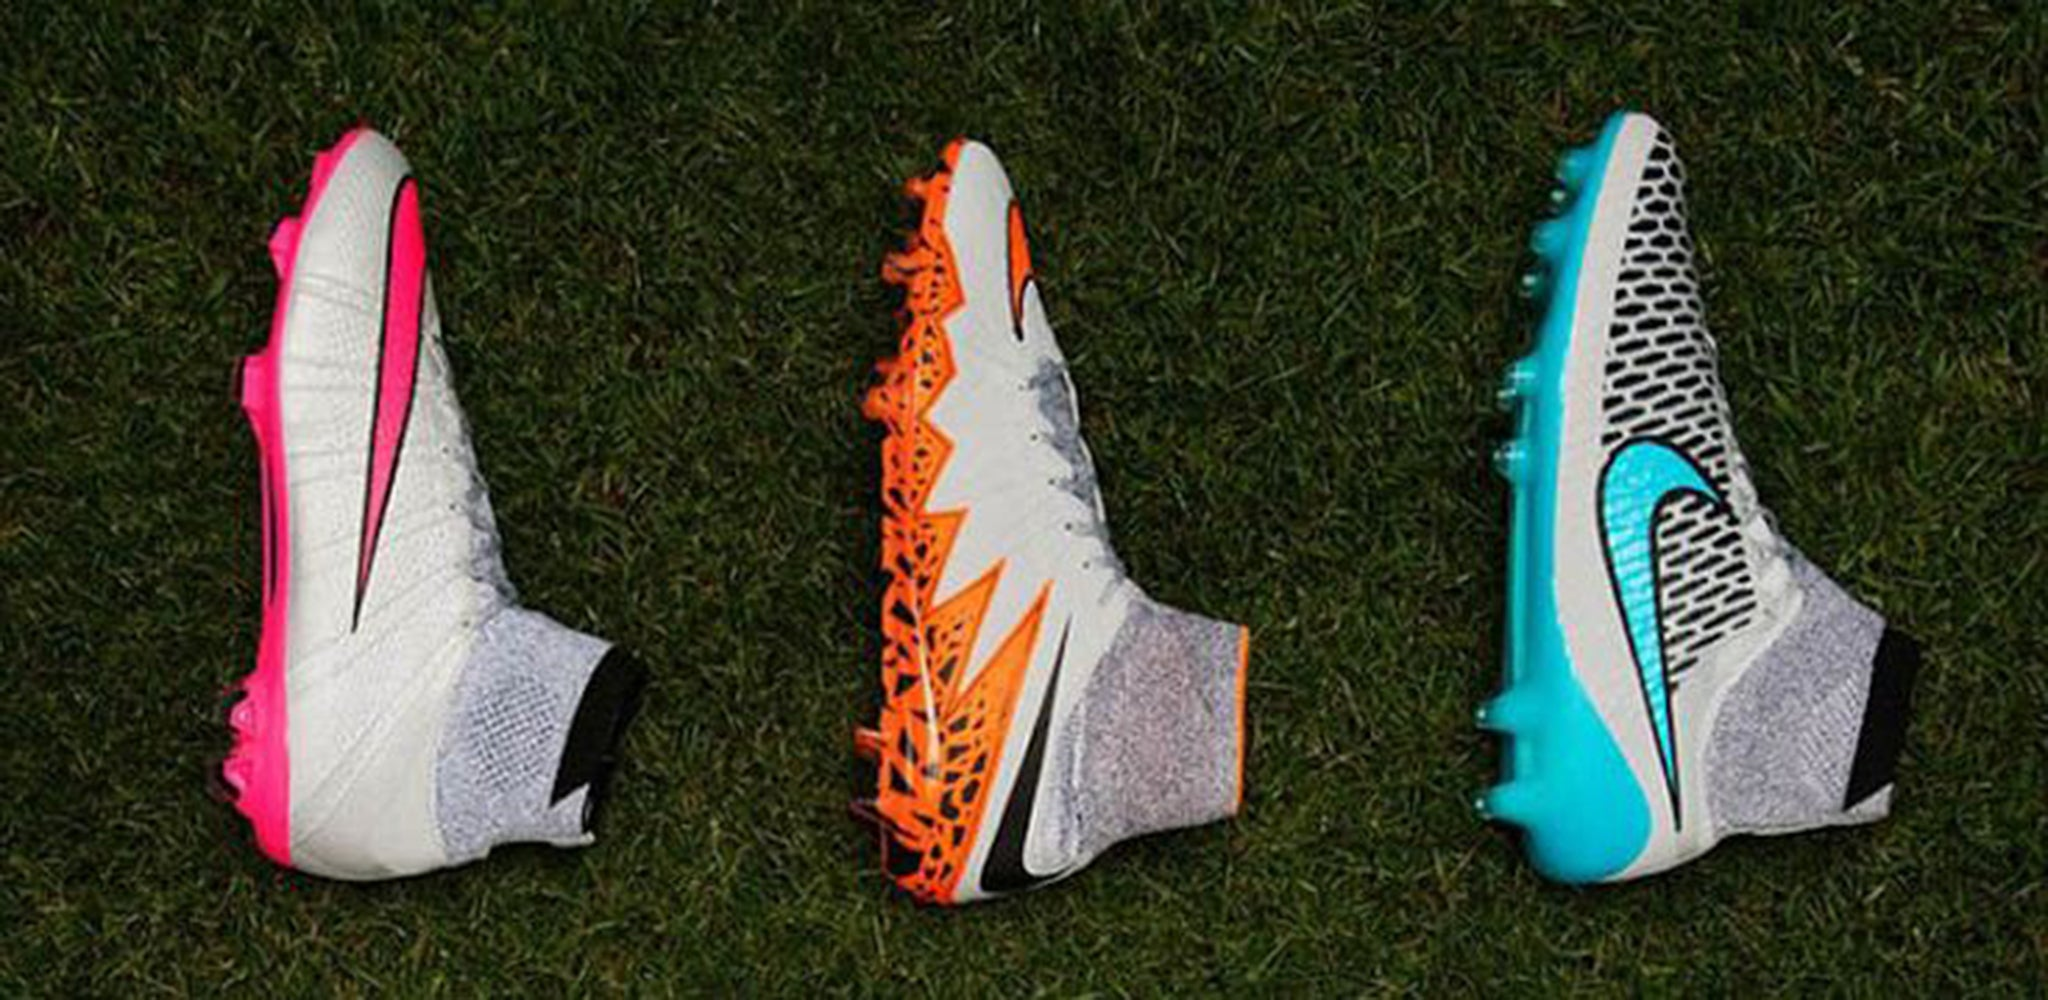 puma boots football 2015